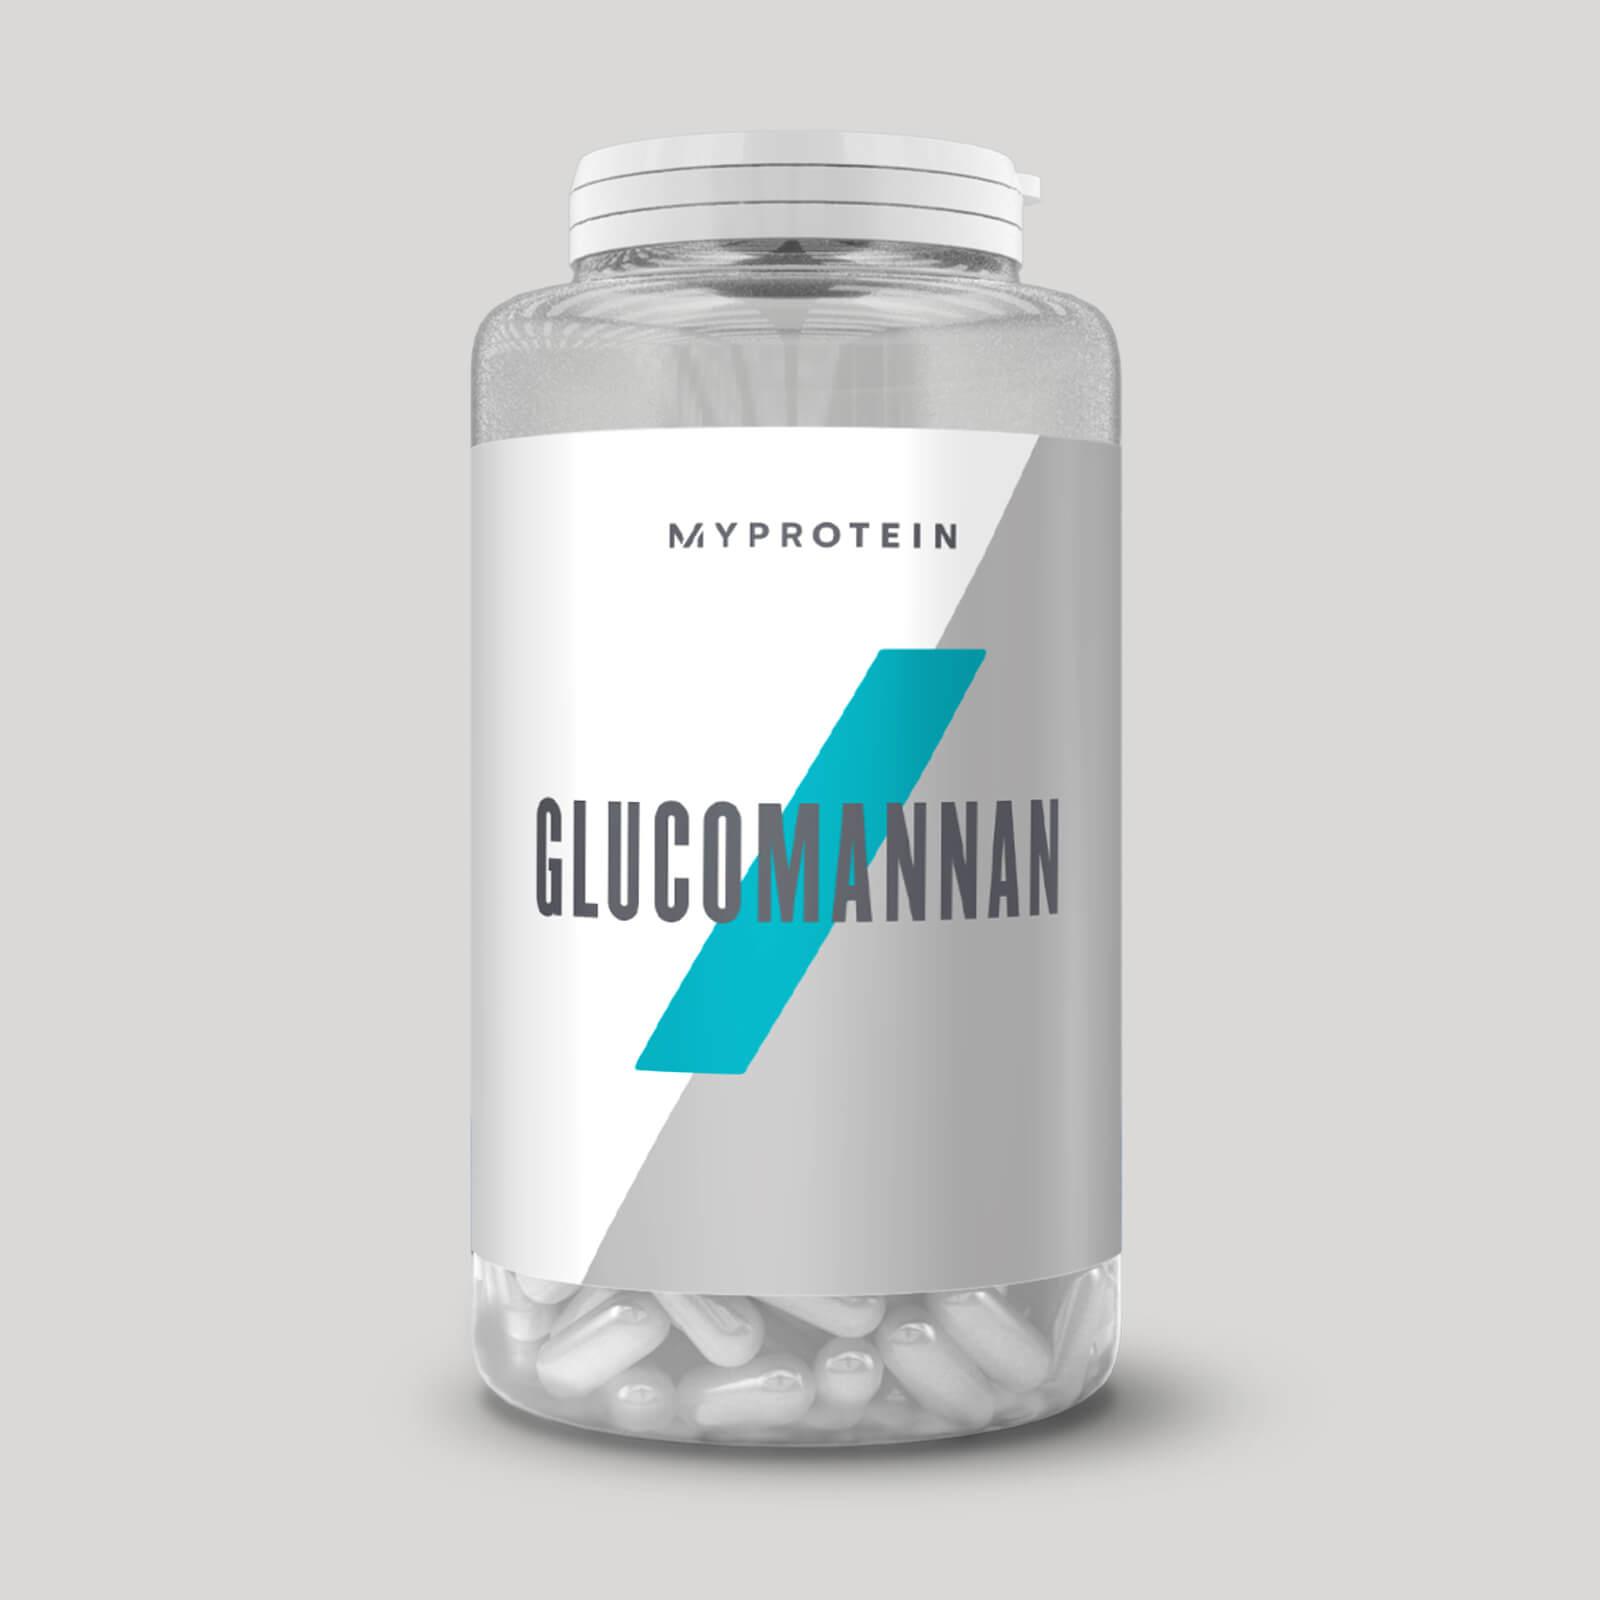 Myprotein Glucomannane - 90Gélules - Sans arôme ajouté